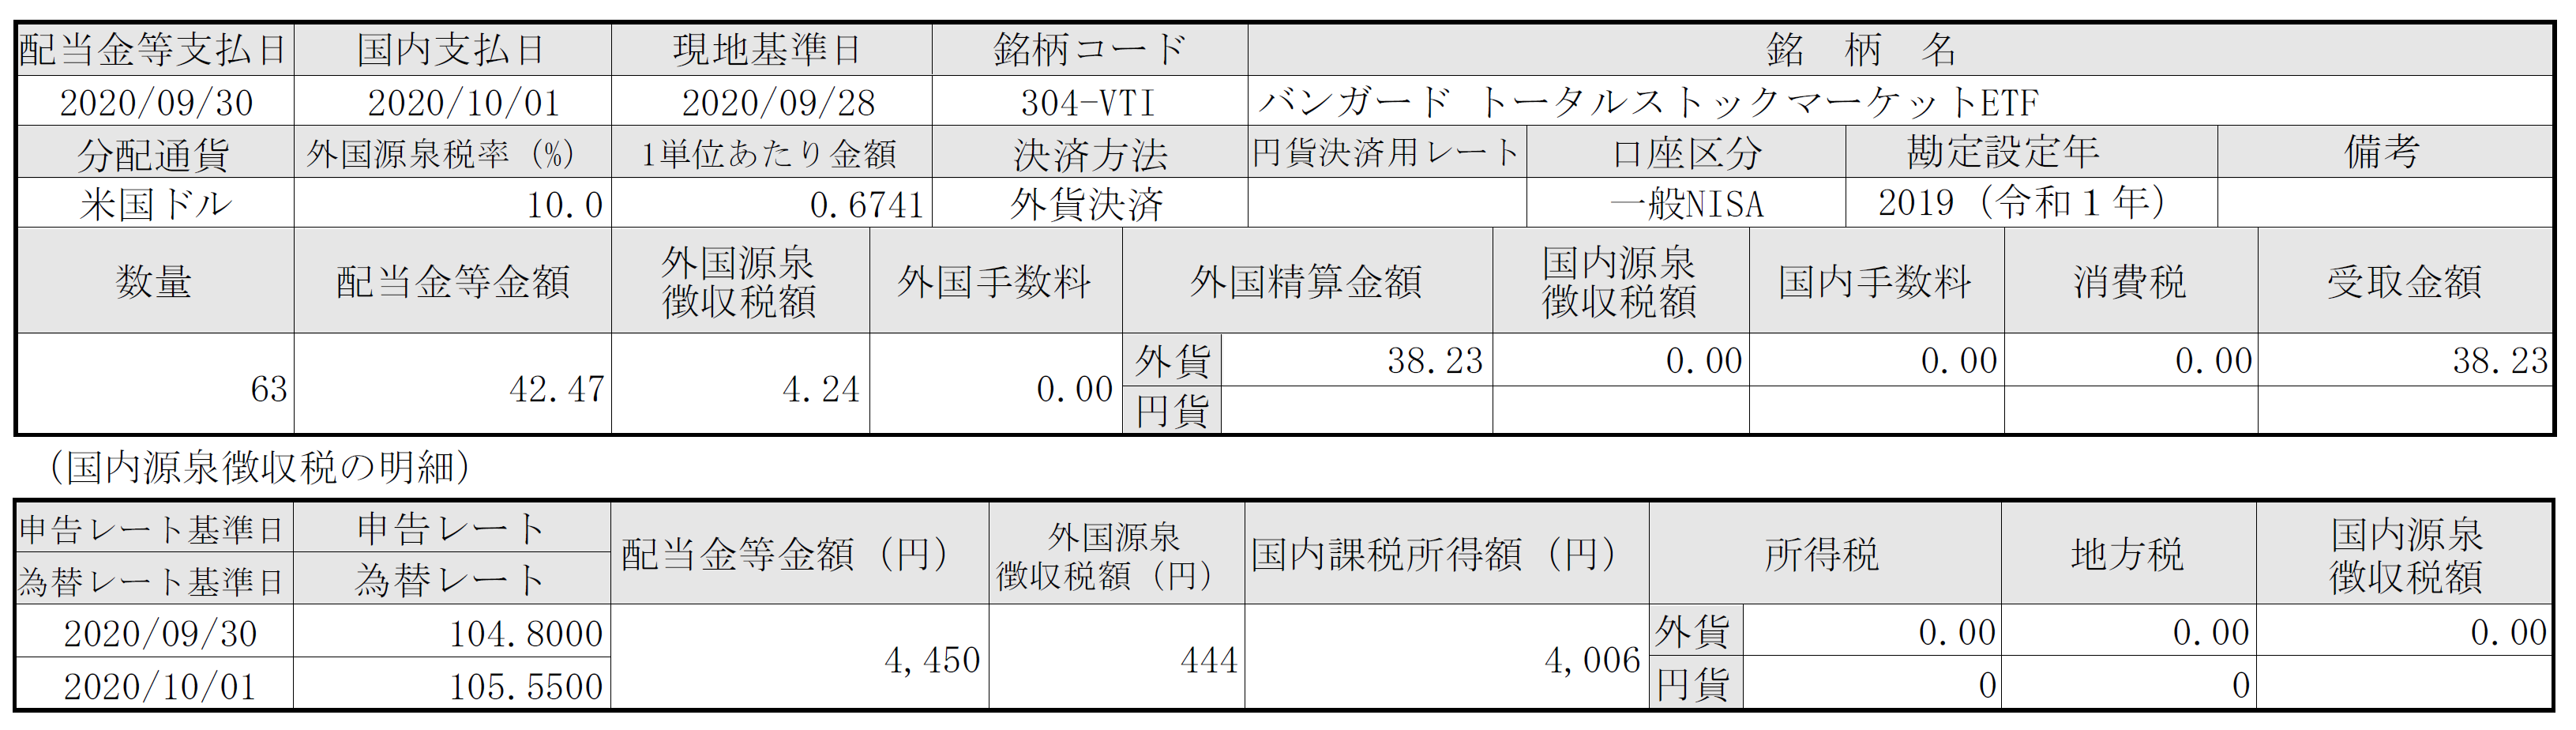 f:id:hodo-work:20201007163633p:plain